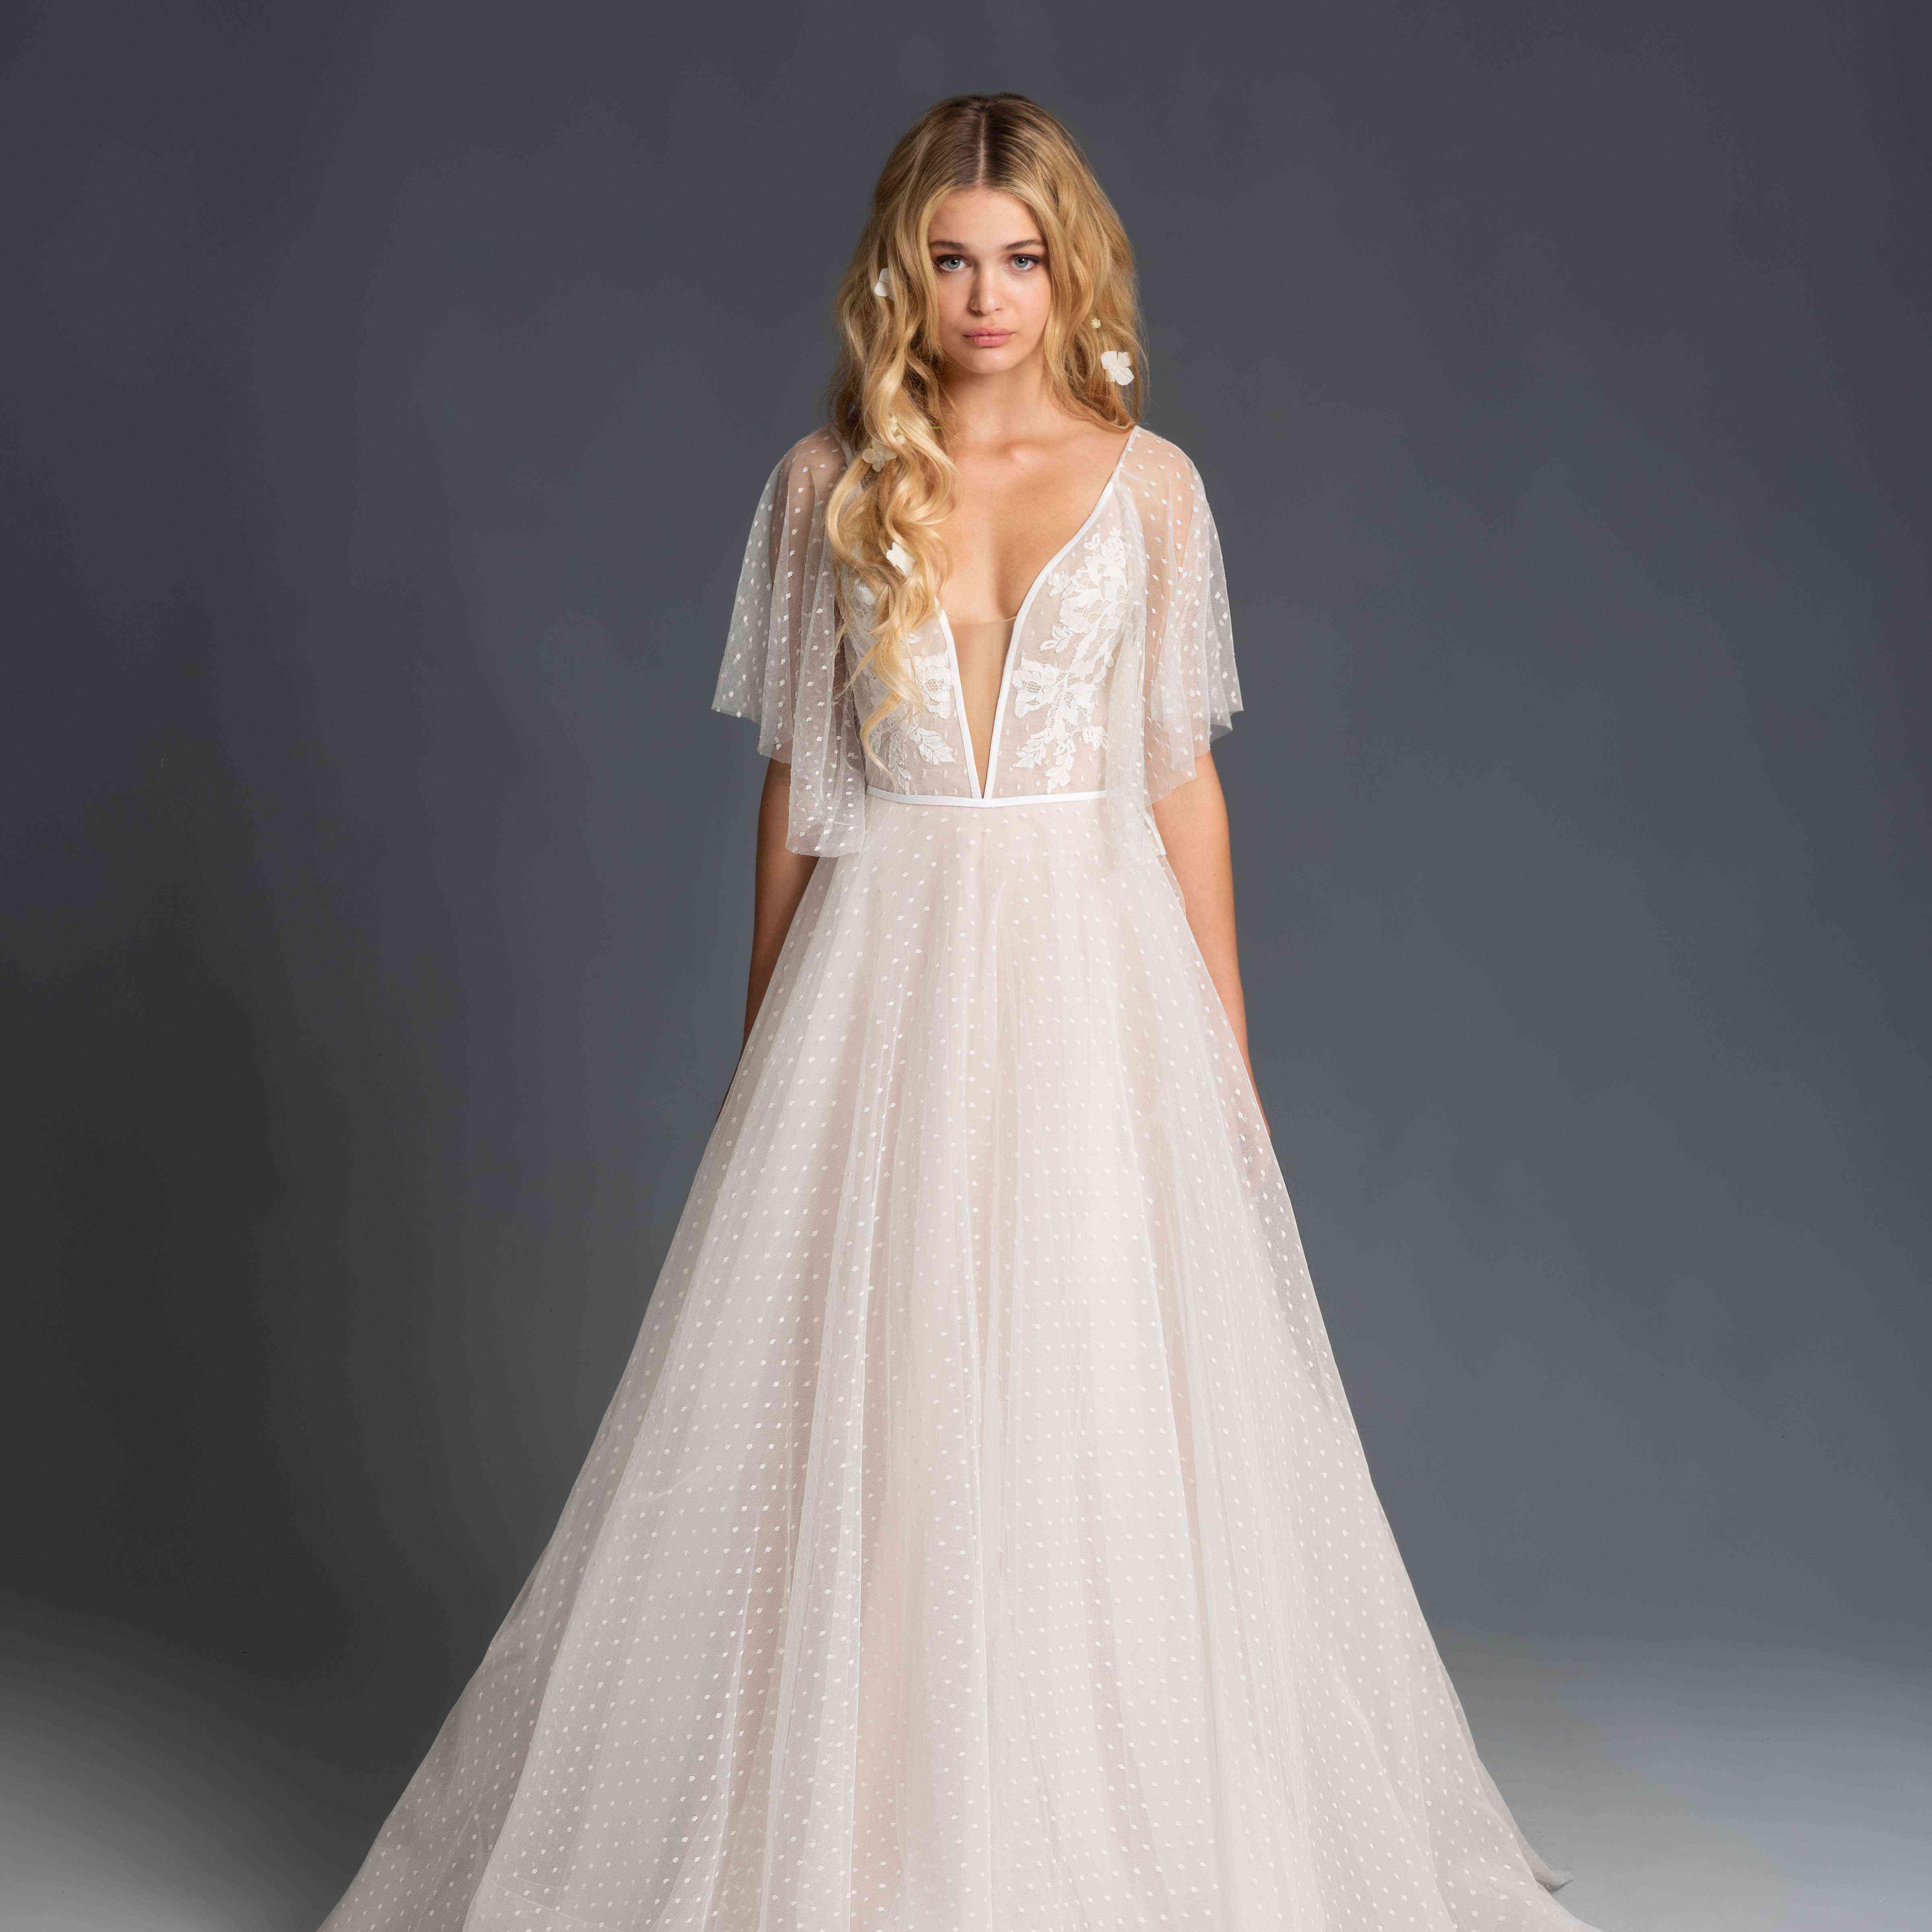 Model in flutter sleeve wedding dress